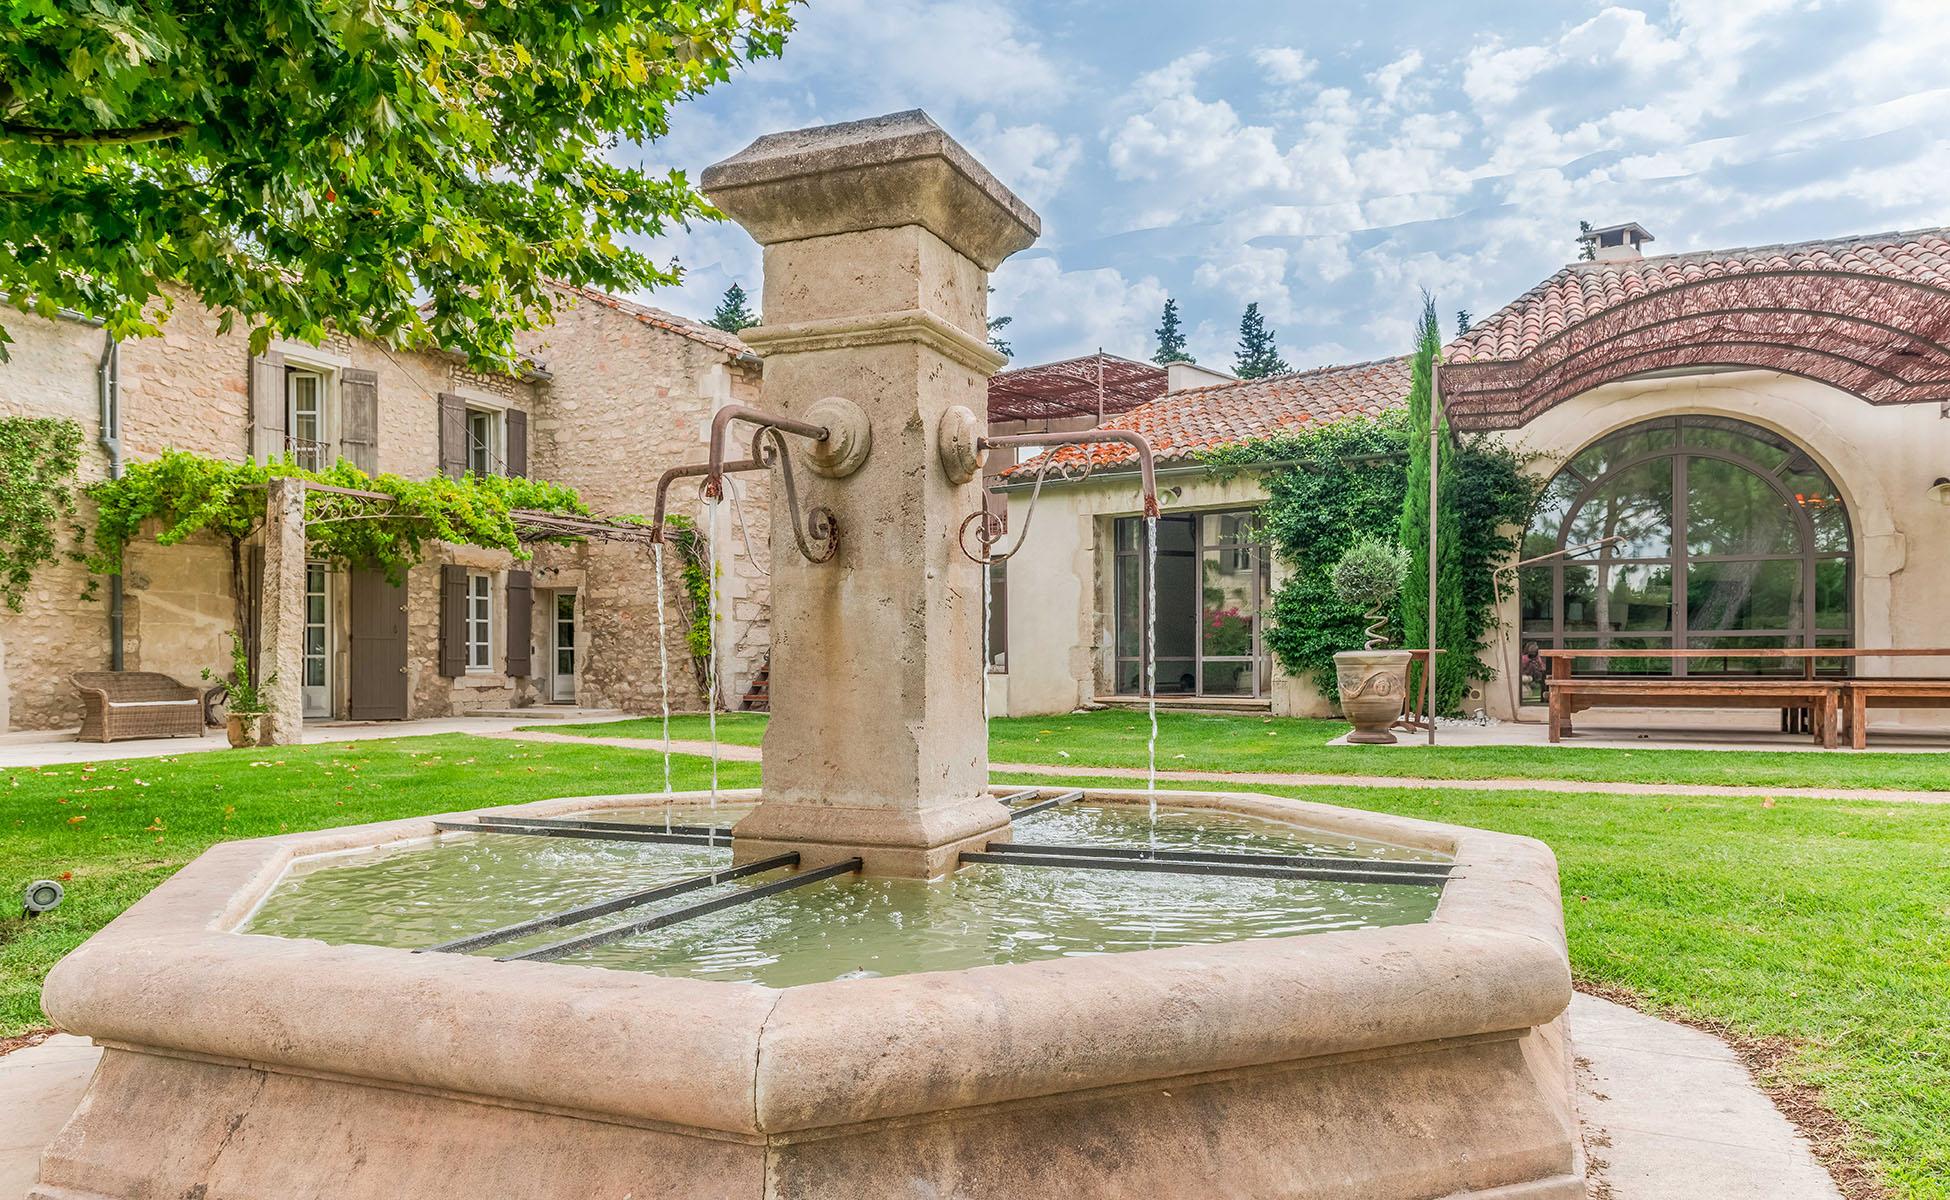 Lovelydays luxury service apartment rental - St Rémy de Provence and surroundings - Ameu Mas - Partner - 6 bedrooms - 6 bathrooms - Lovely garden - 9e06c77a23ce - Lovelydays